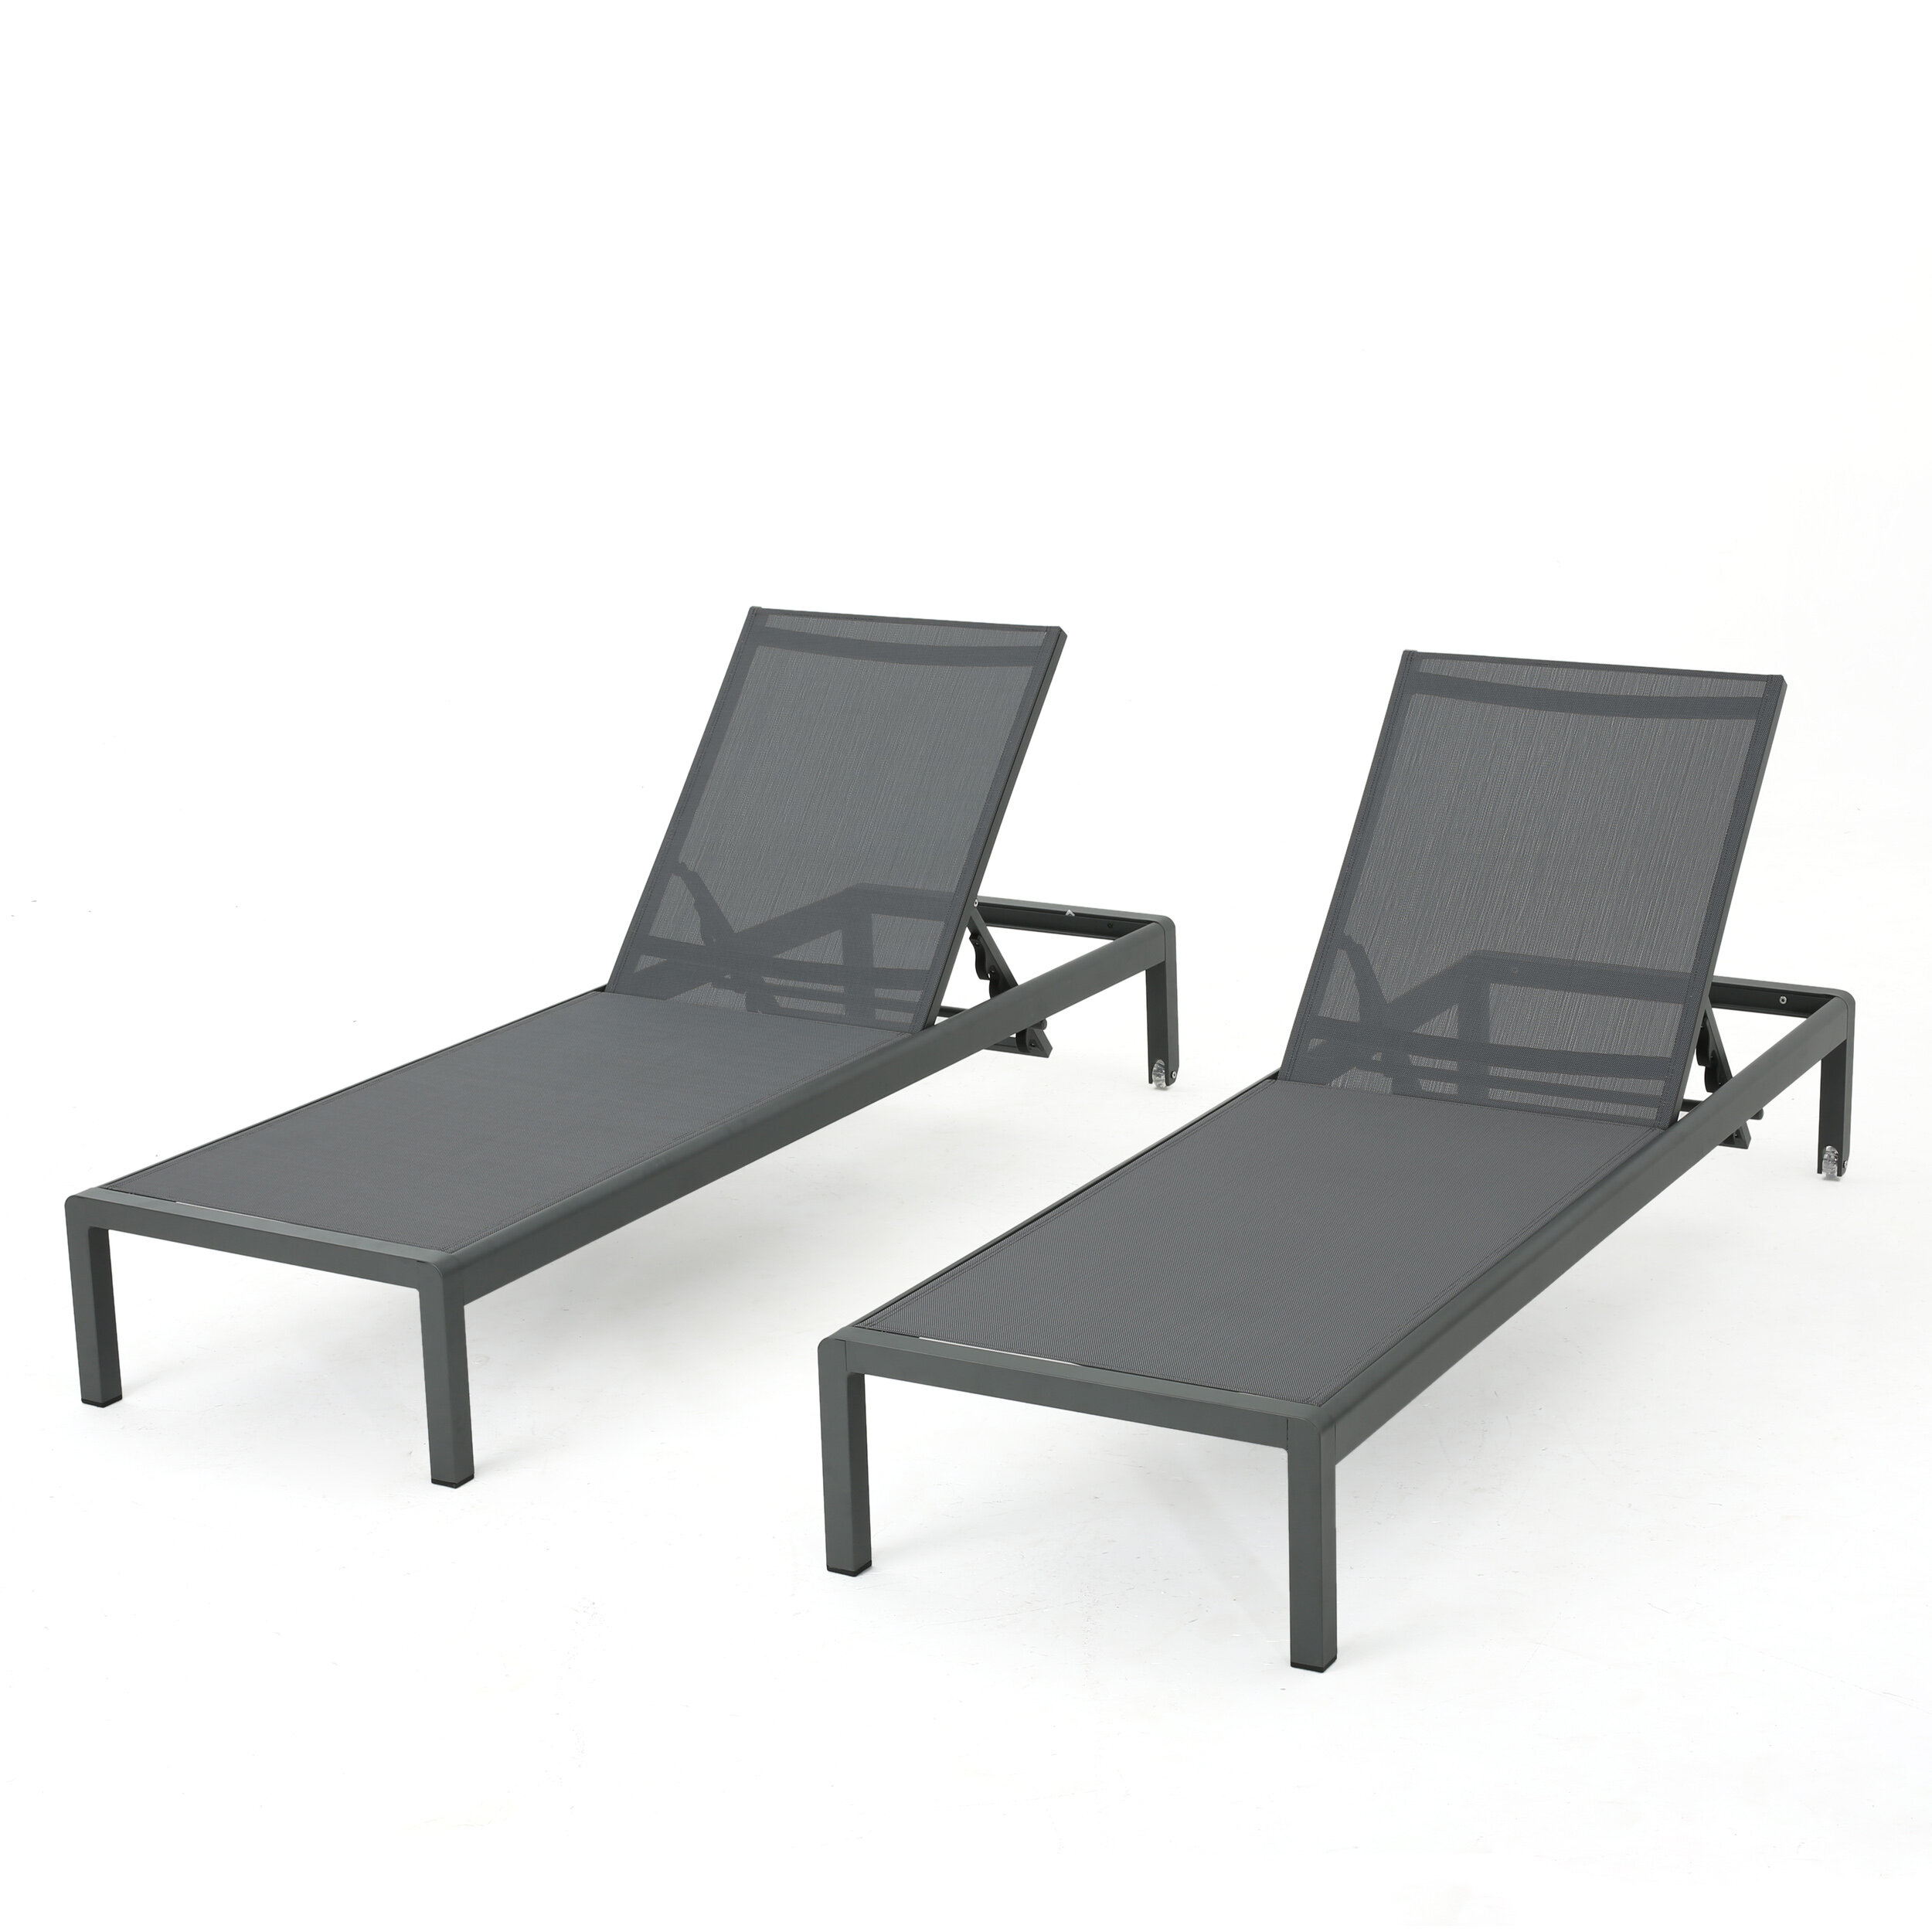 Crosstown aluminum mesh chaise lounge reviews joss main